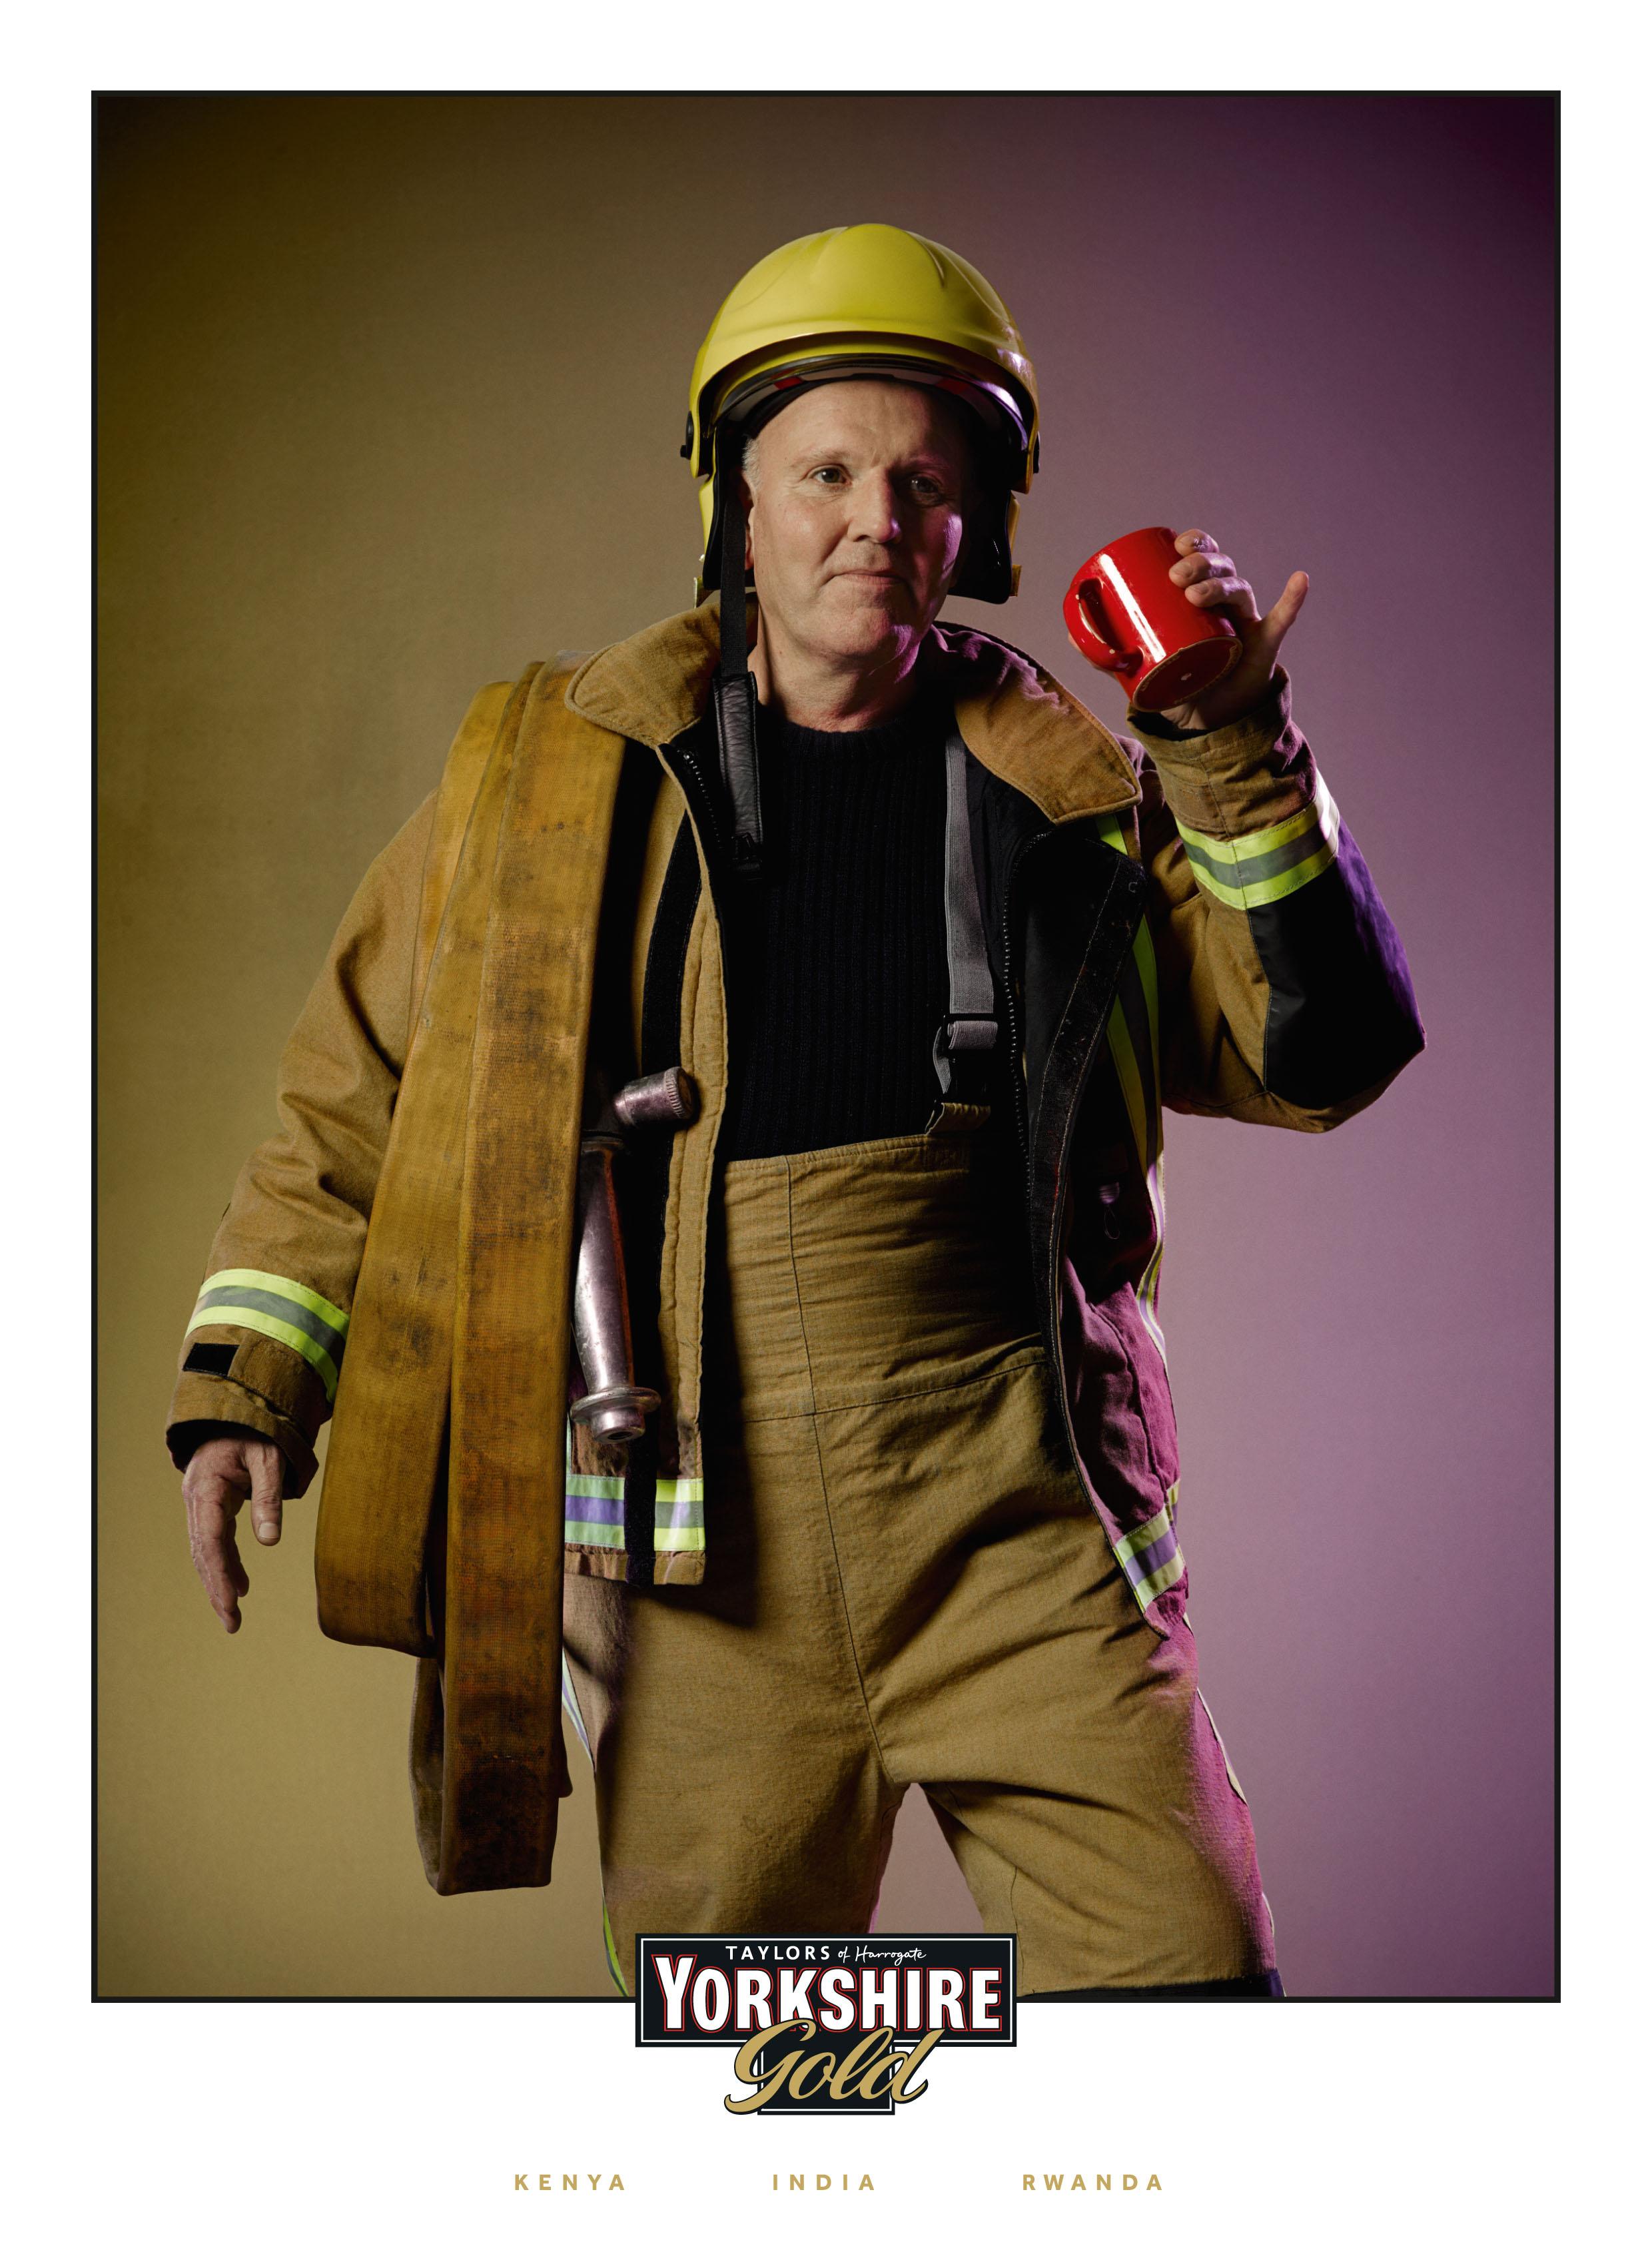 Yorkshire Gold: Fireman